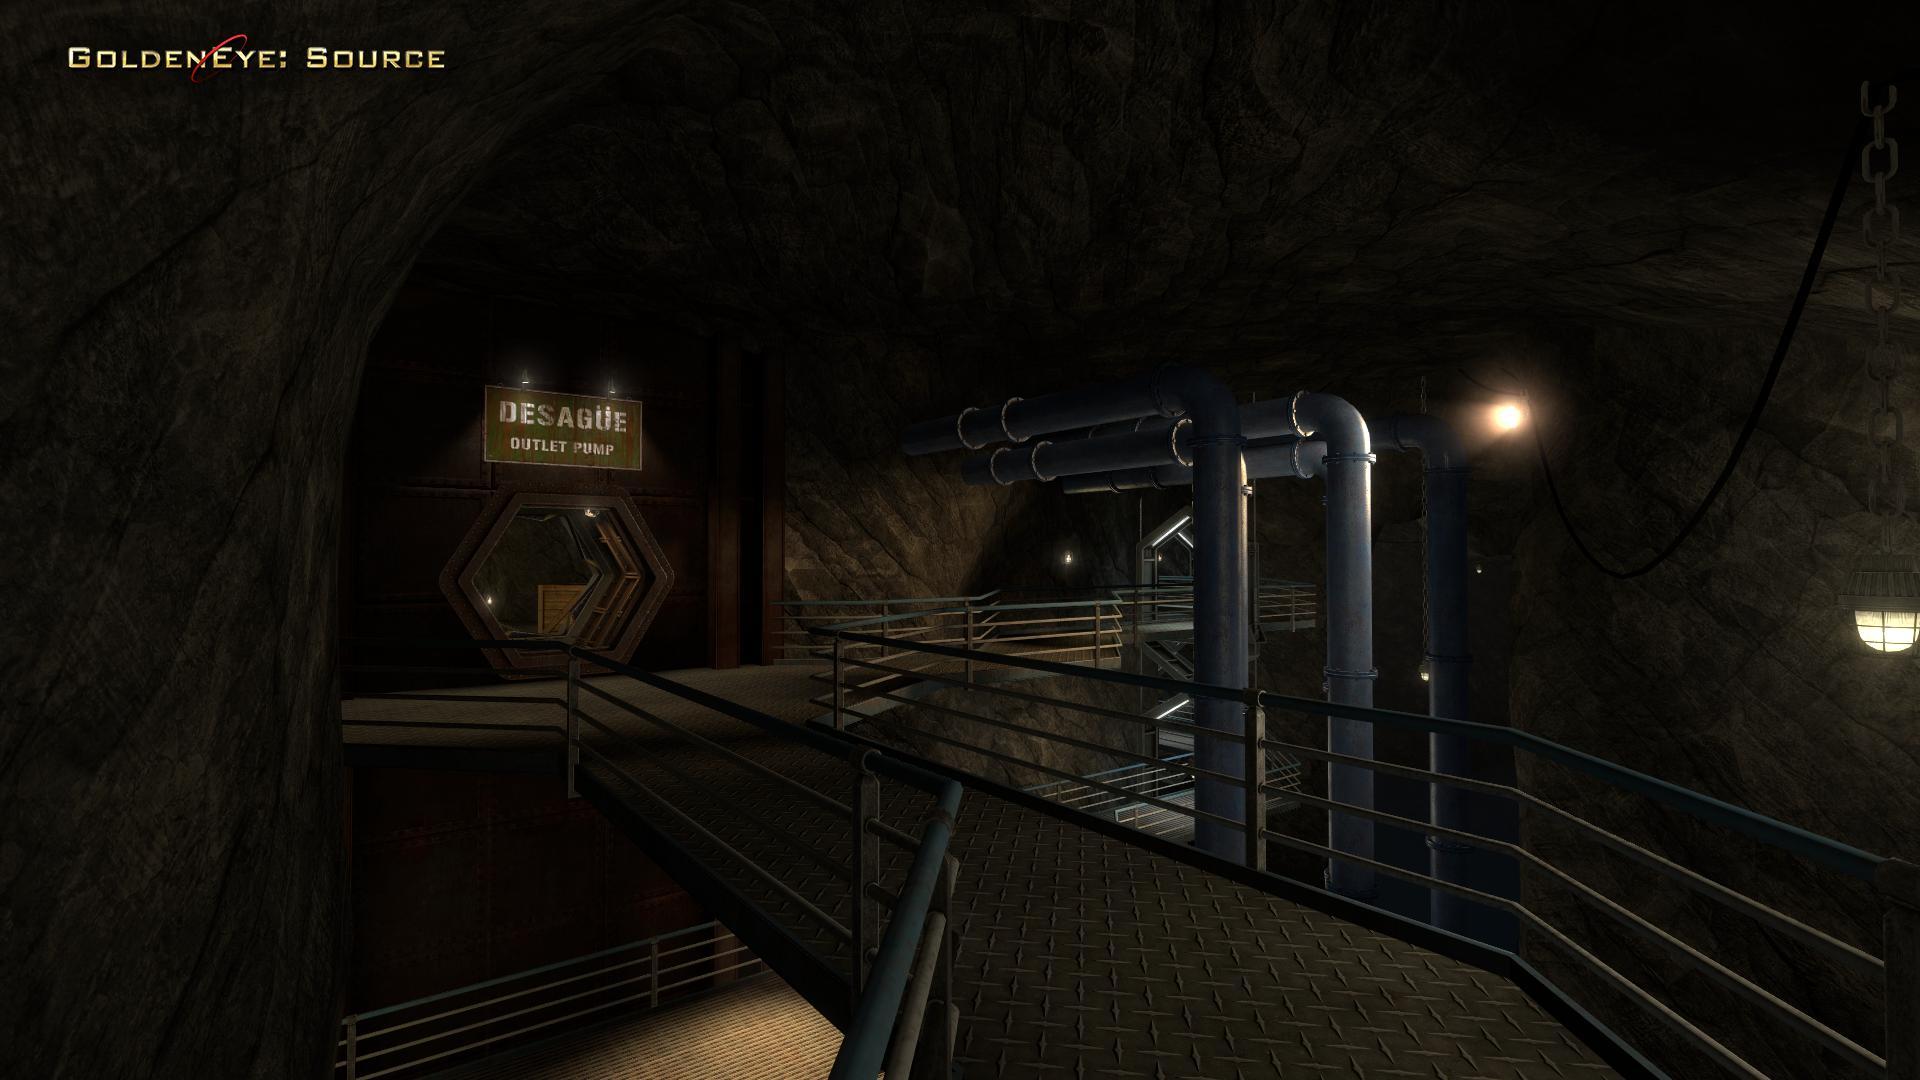 GoldenEye: Source mod for Half-Life 2 - Mod DB  Goldeneye